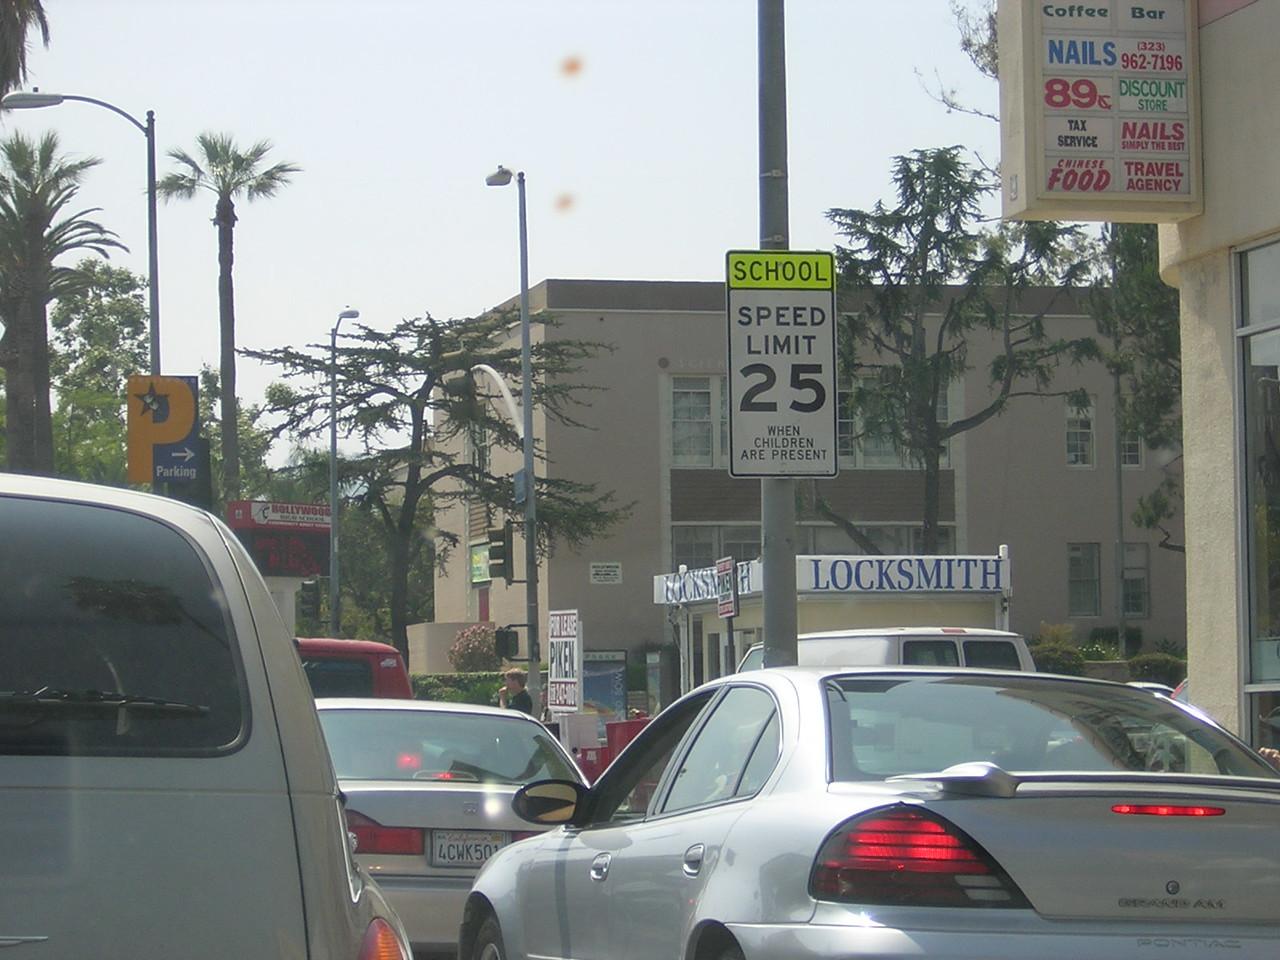 Sunset Boulevard (Hollywood High)nDSCN3160